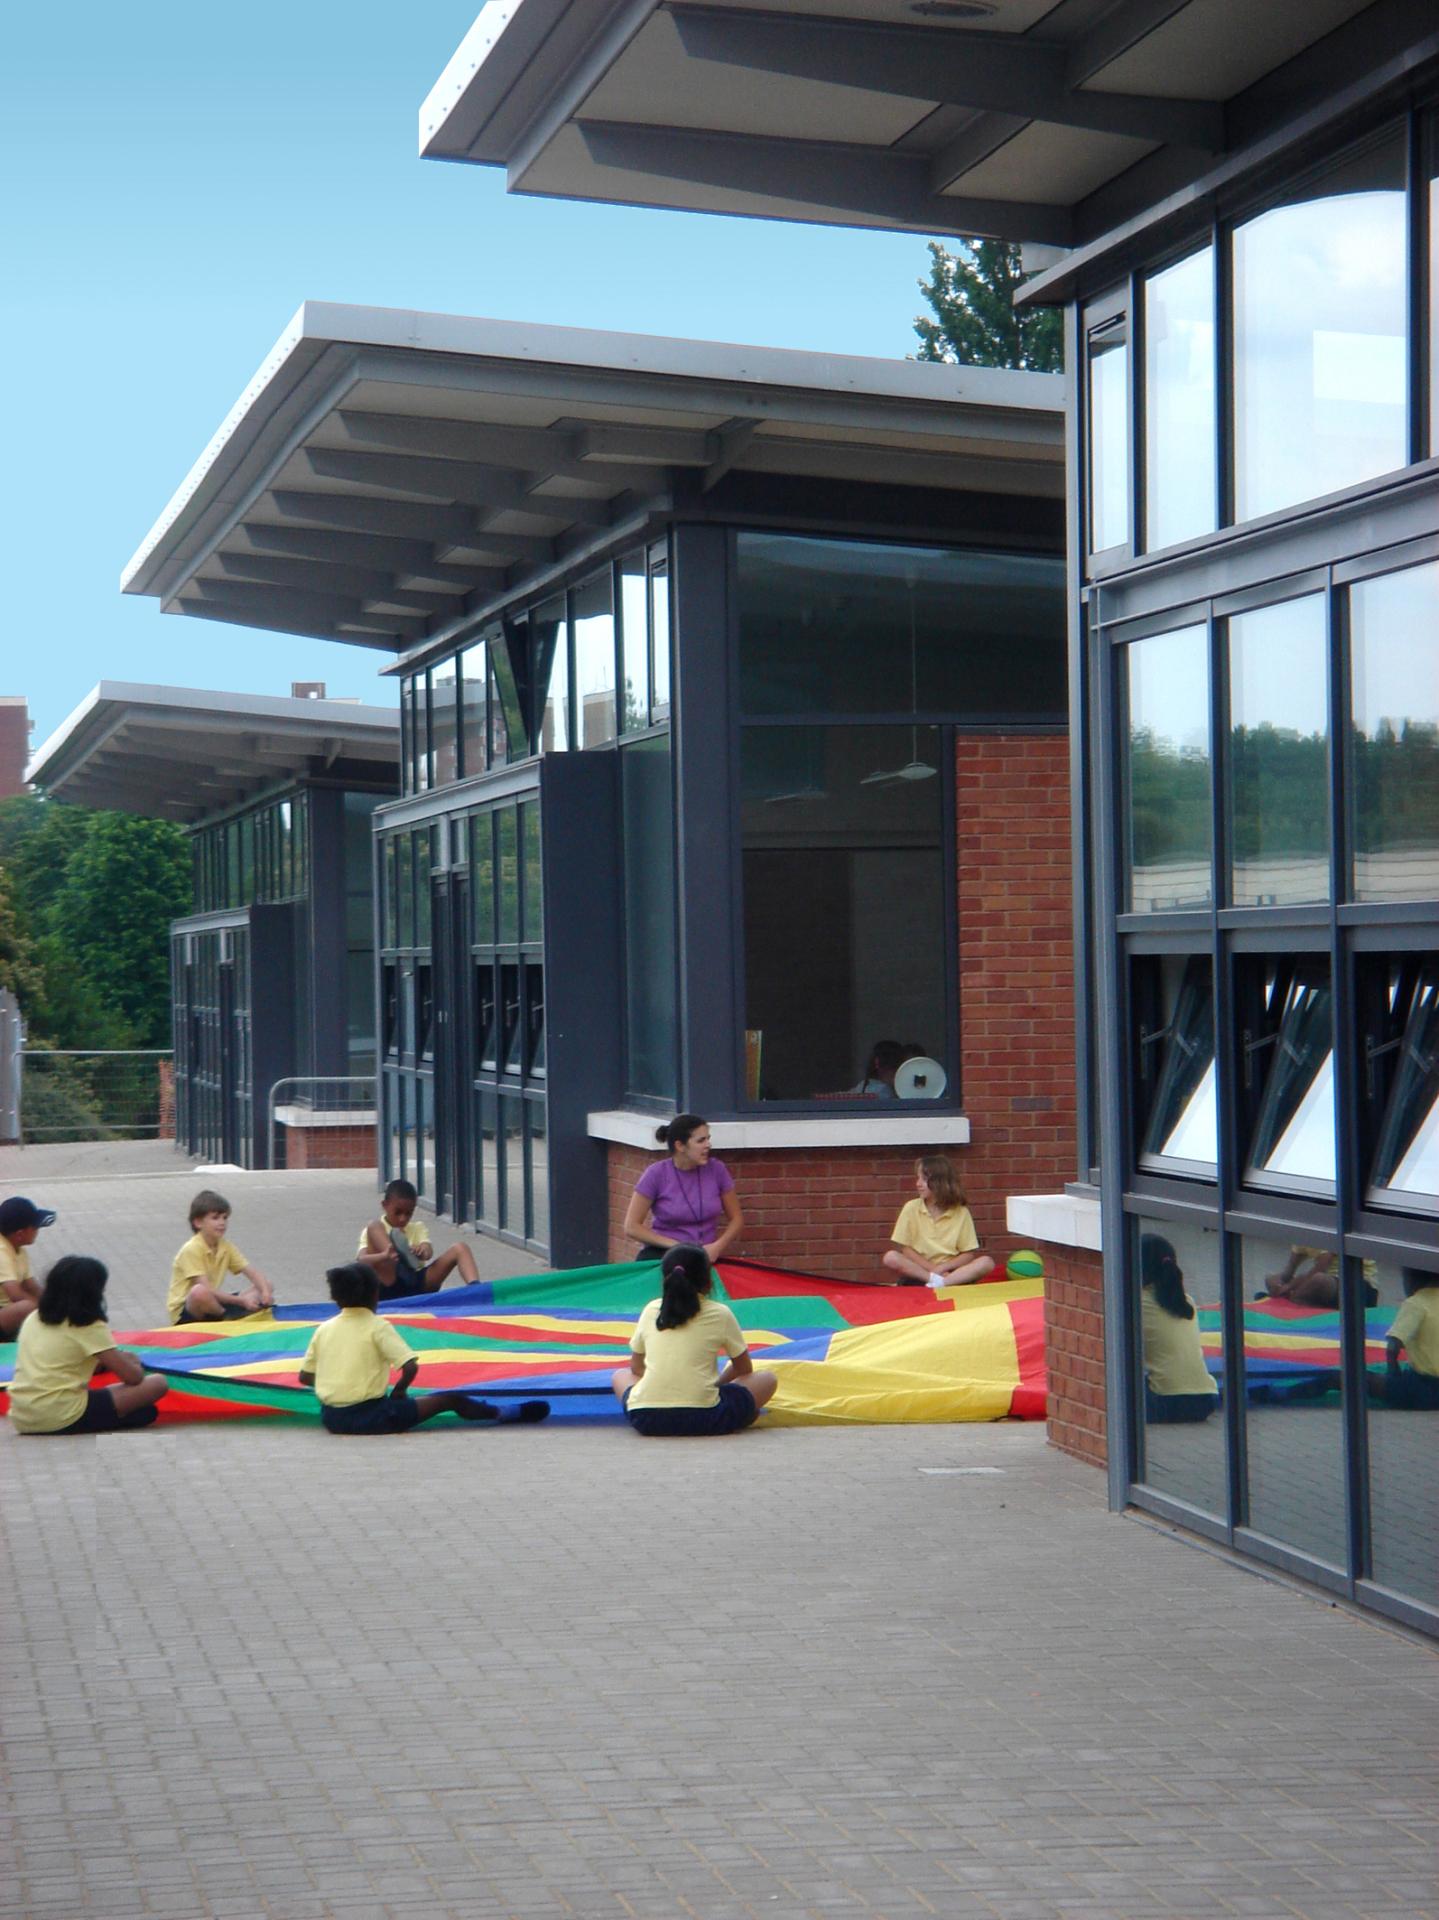 St. Judes Primary School (Wolverhampton) by BHN architect